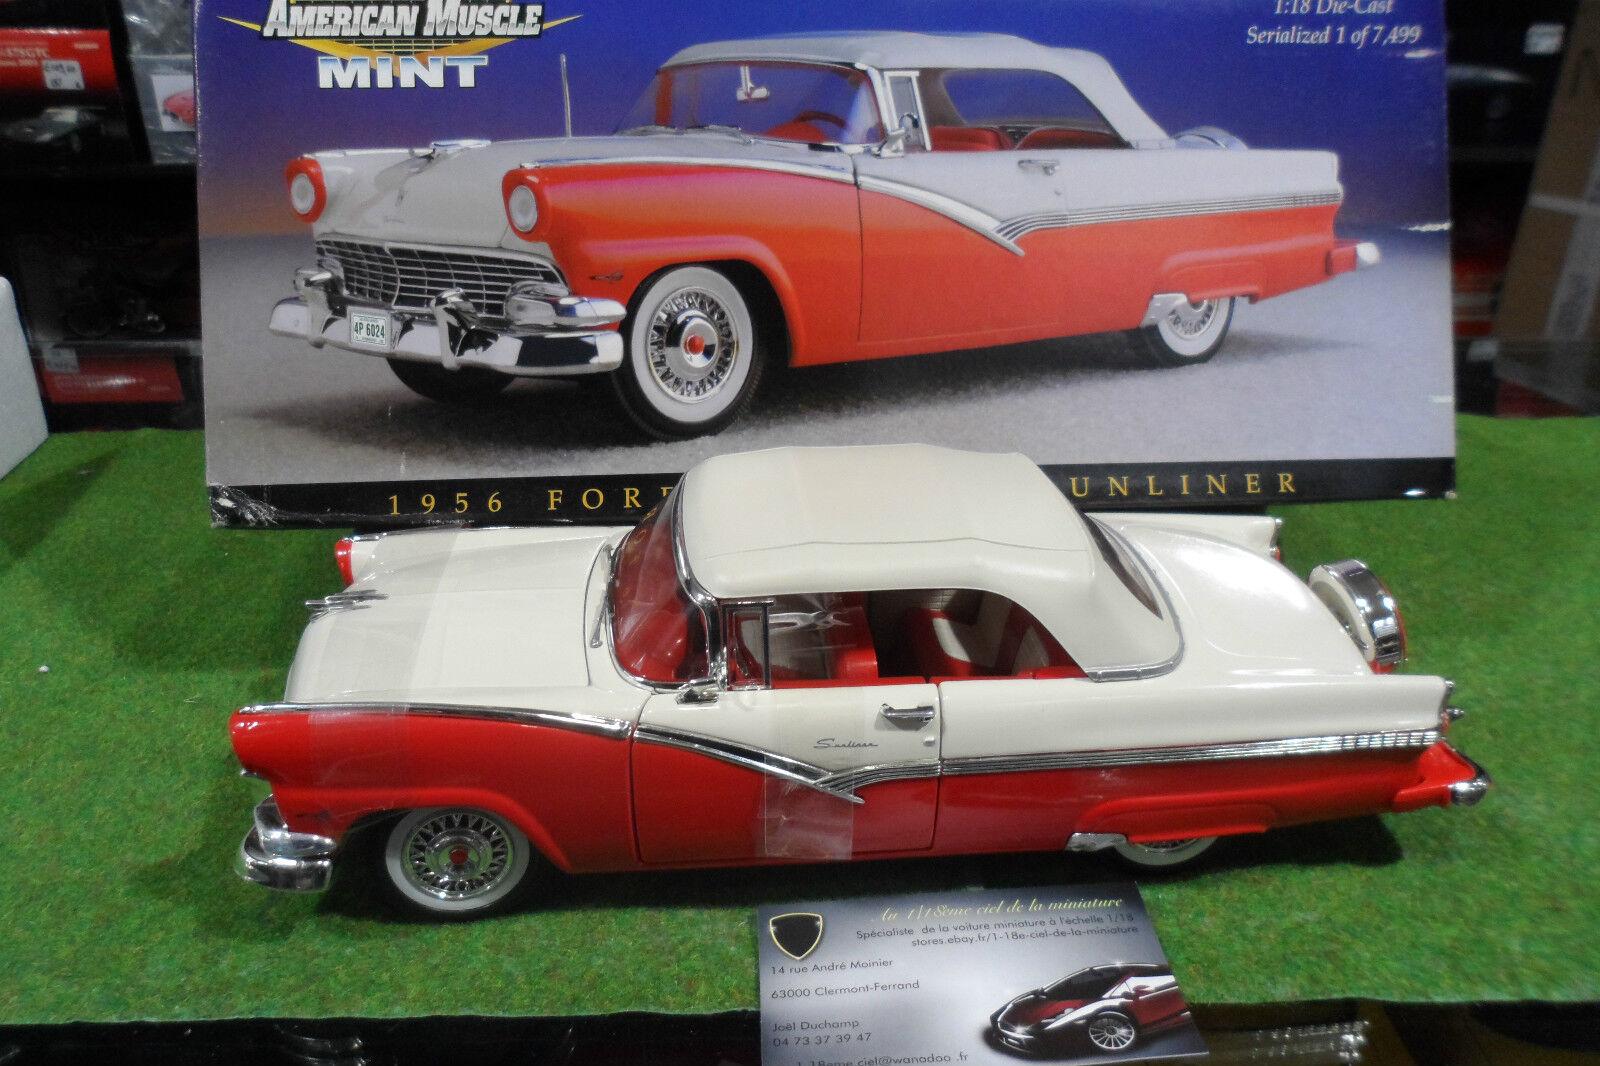 venta caliente FORD FAIRLANE SUNLINER 1956 cabriolet au 1 18 AMERICAN AMERICAN AMERICAN MUSCLE ERTL 32076 voiture  autentico en linea